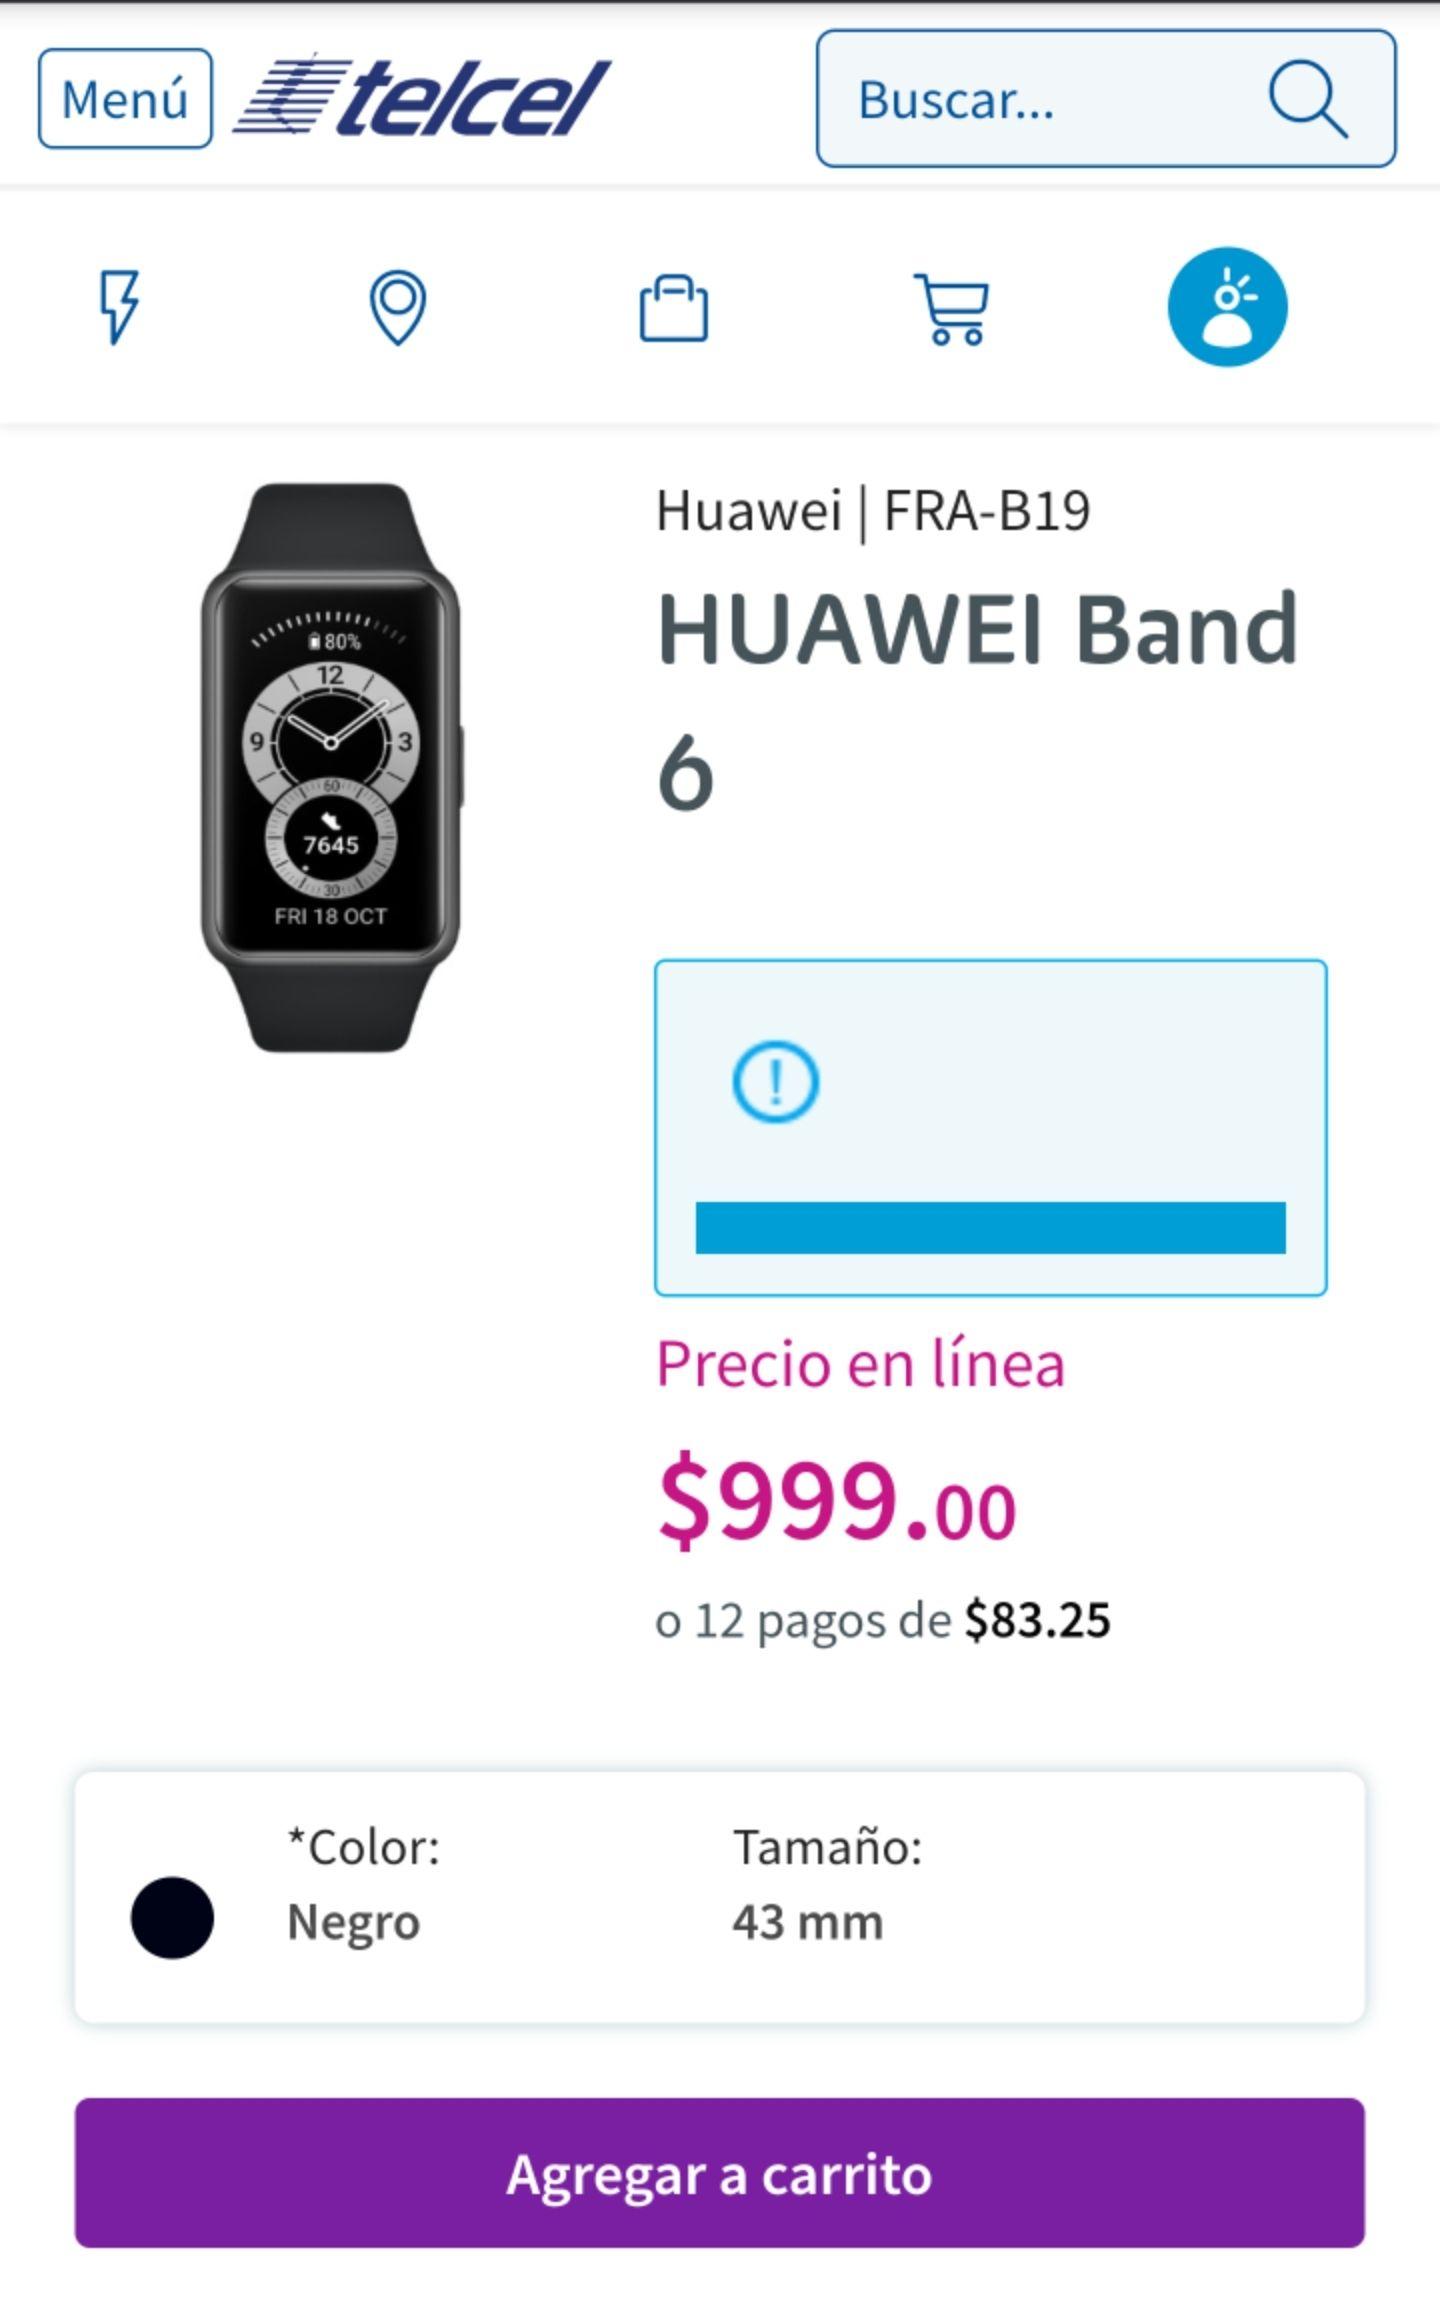 Telcel: Huawei band 6 super precio